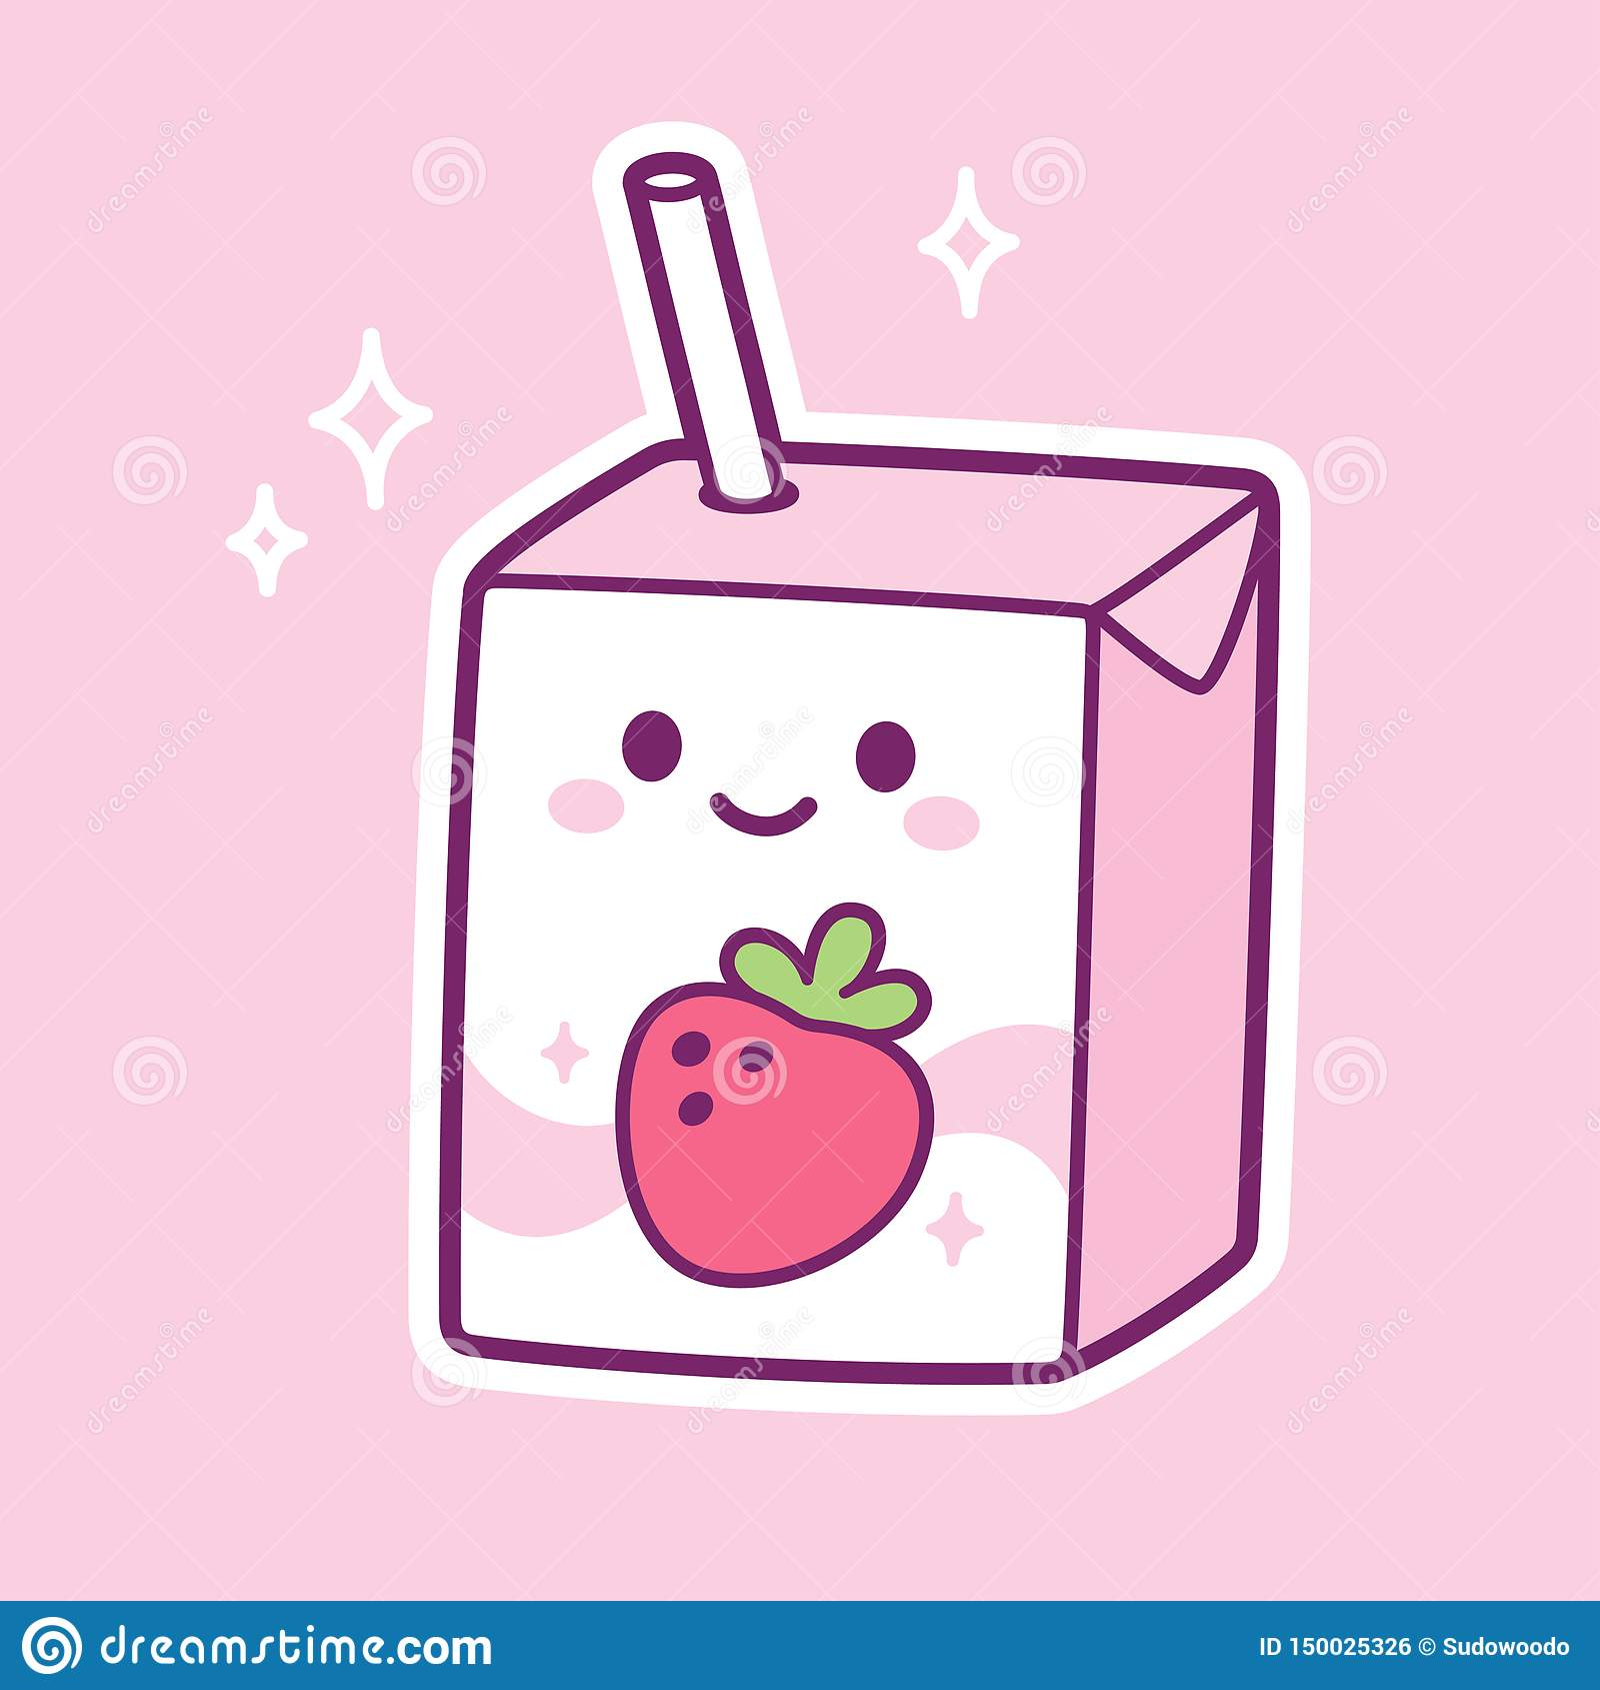 Kawaii Strawberry Milk Stock Vector Illustration Of Kids 150025326